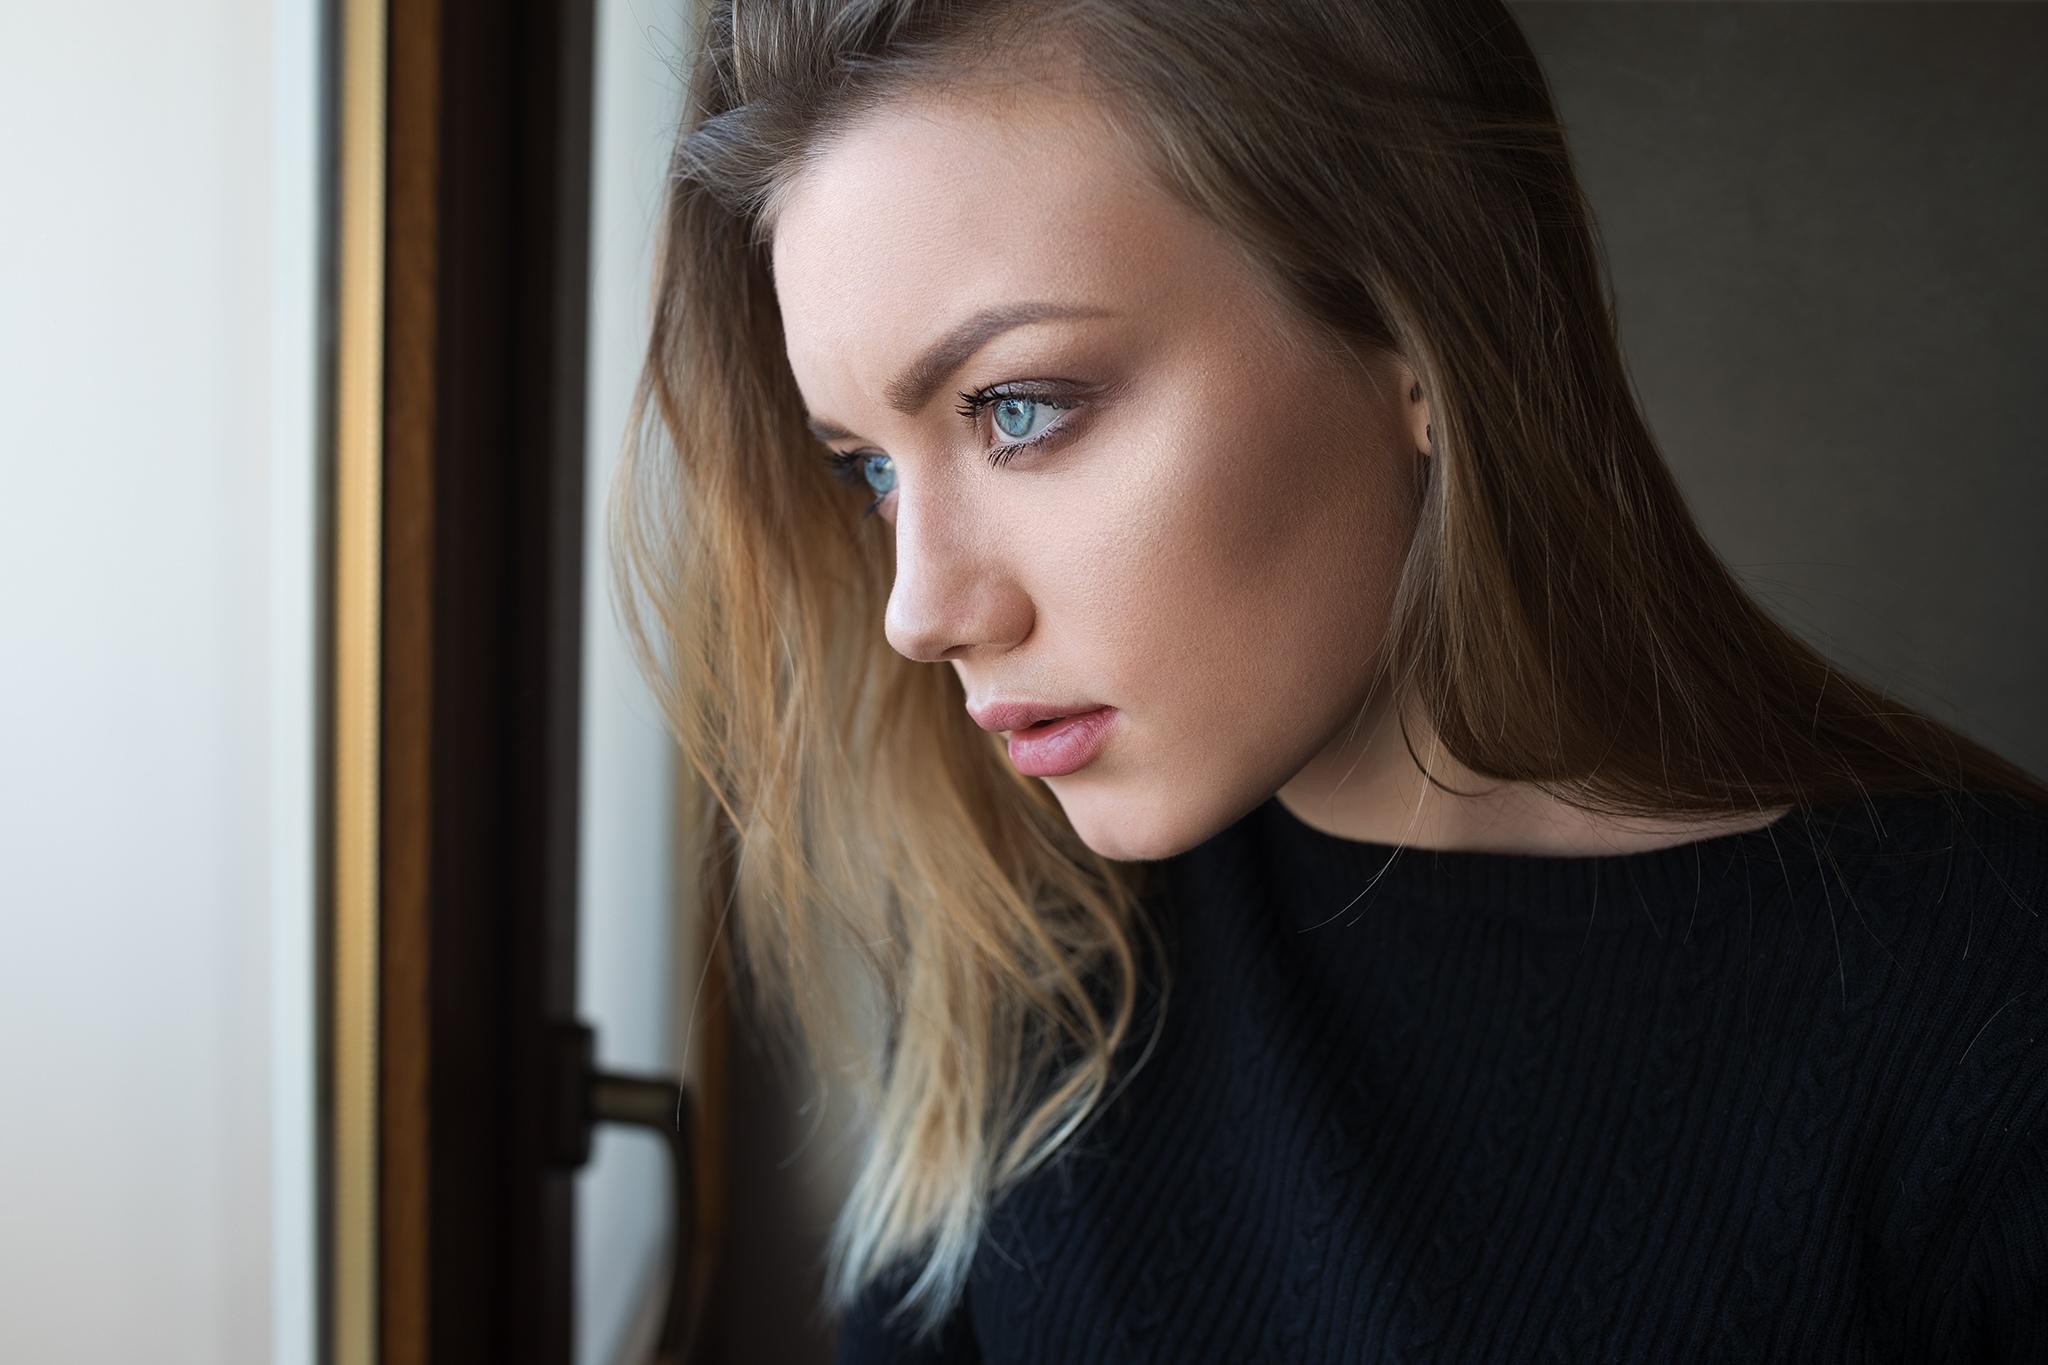 blue eyes looking away indoors dmitry shulgin blonde face women indoors katya profile women dmitry sn model sweater portrait